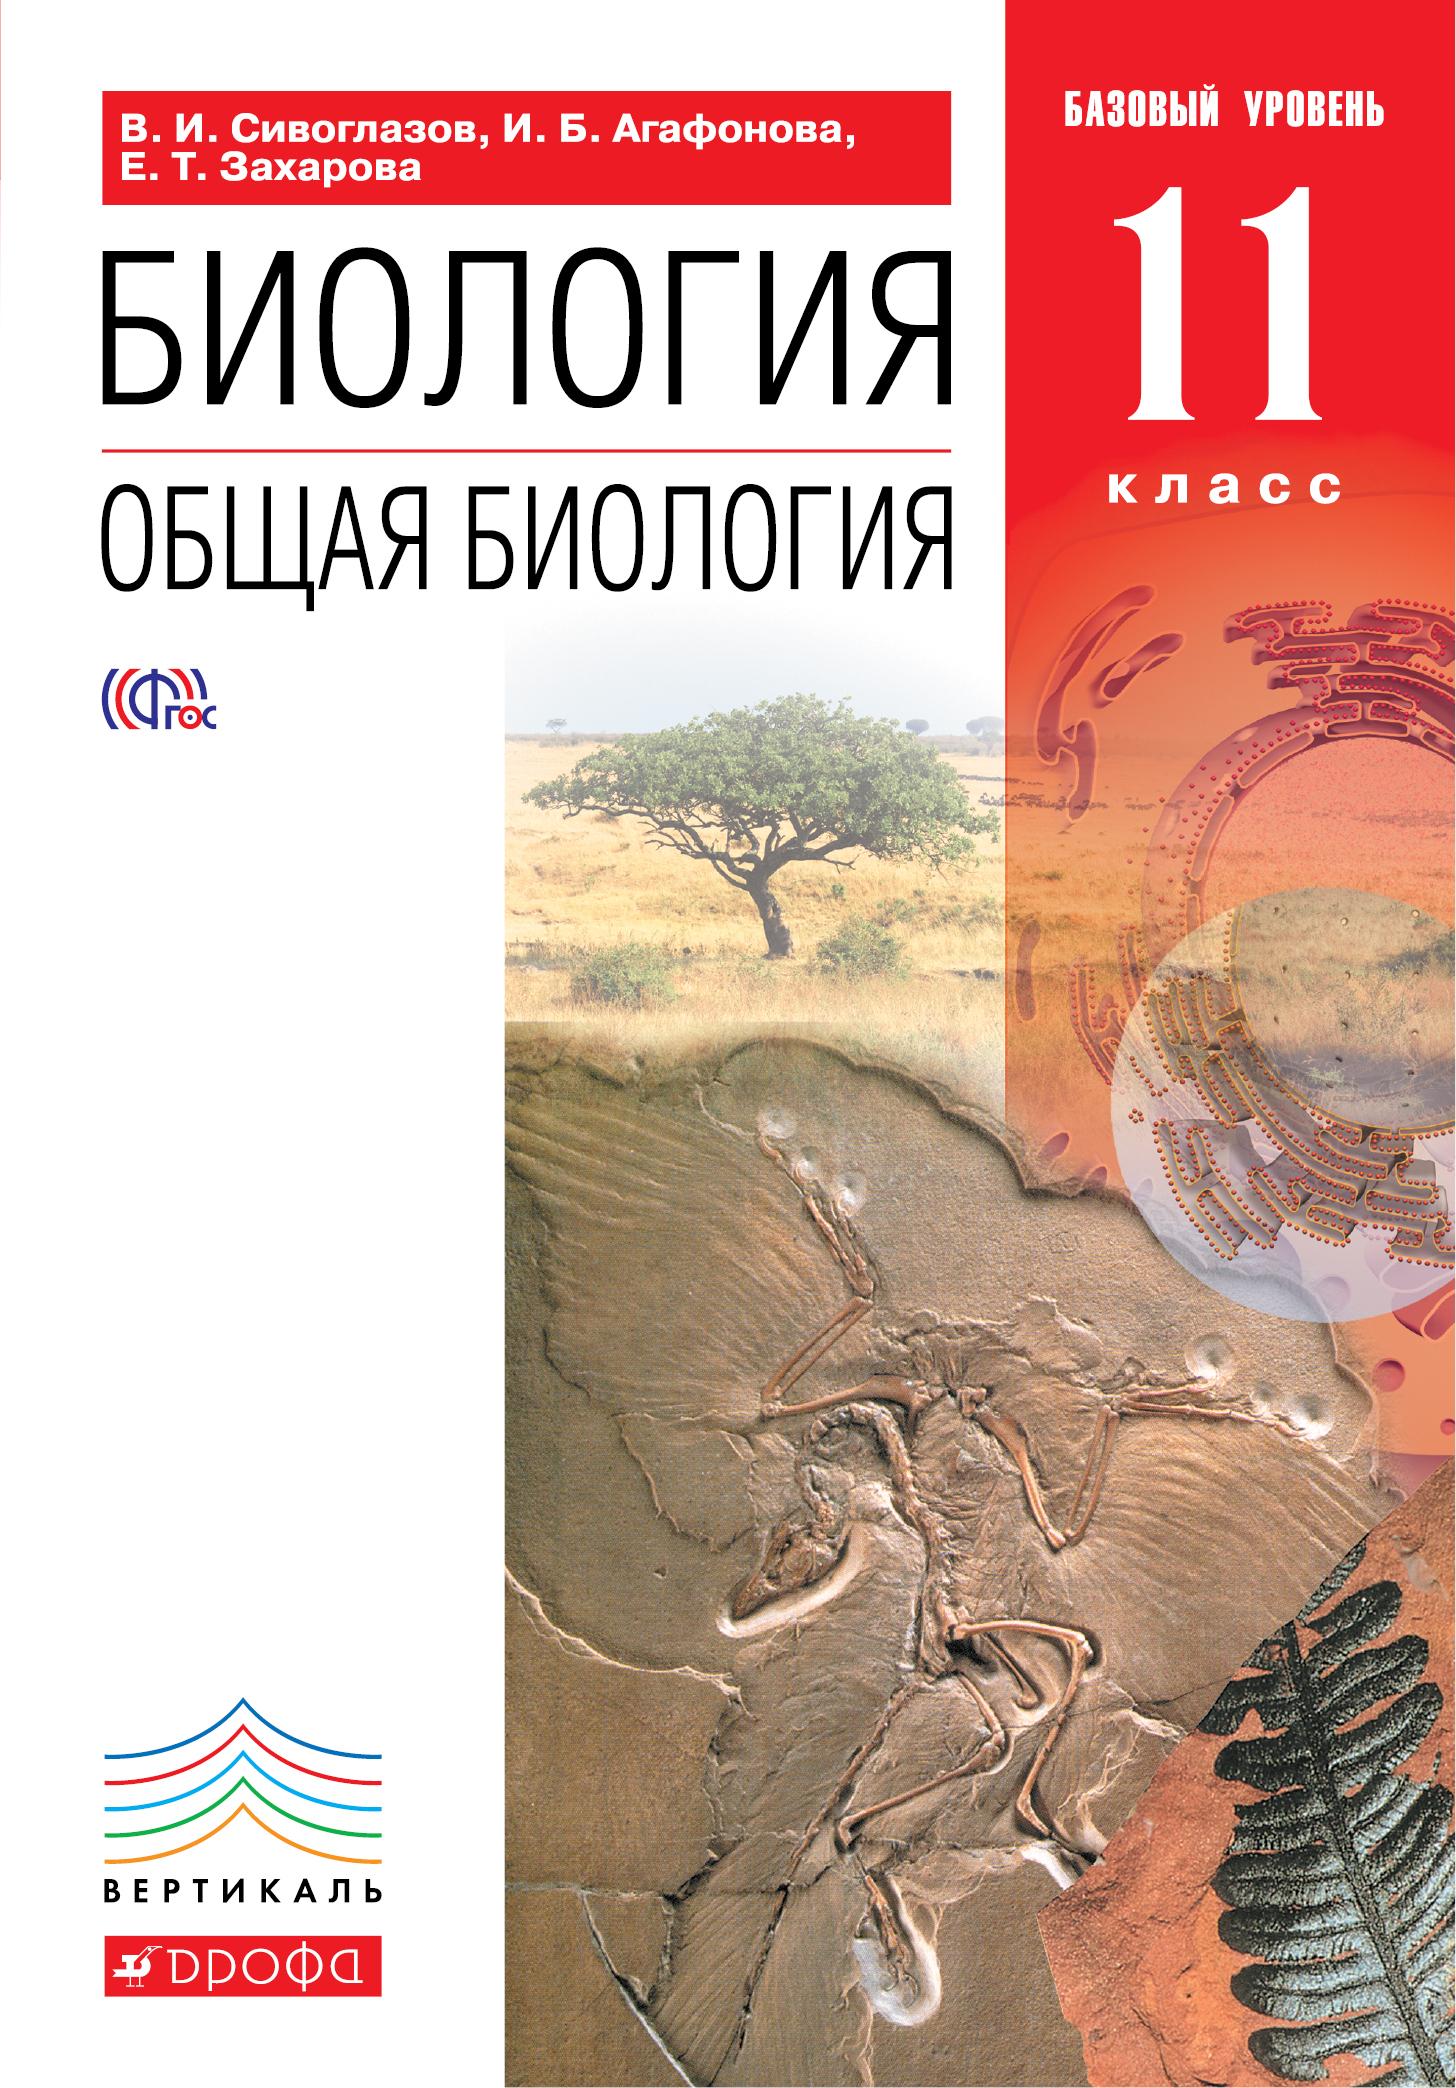 Общая биология 11кл [Учебник] баз. ур. ВЕРТИКАЛЬ